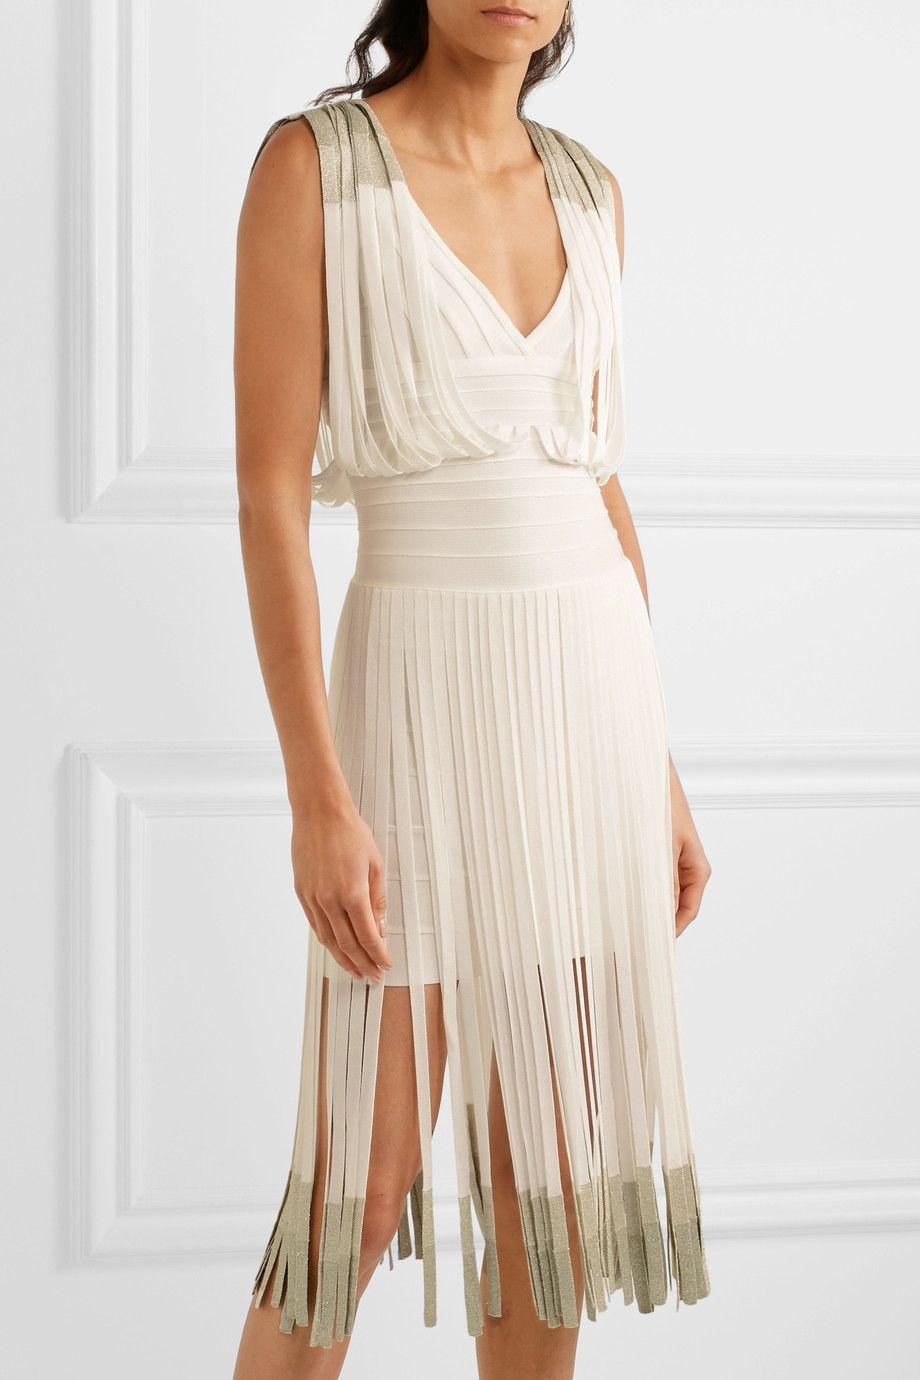 Hervé léger fringed dégradé bandage dress fashion lust